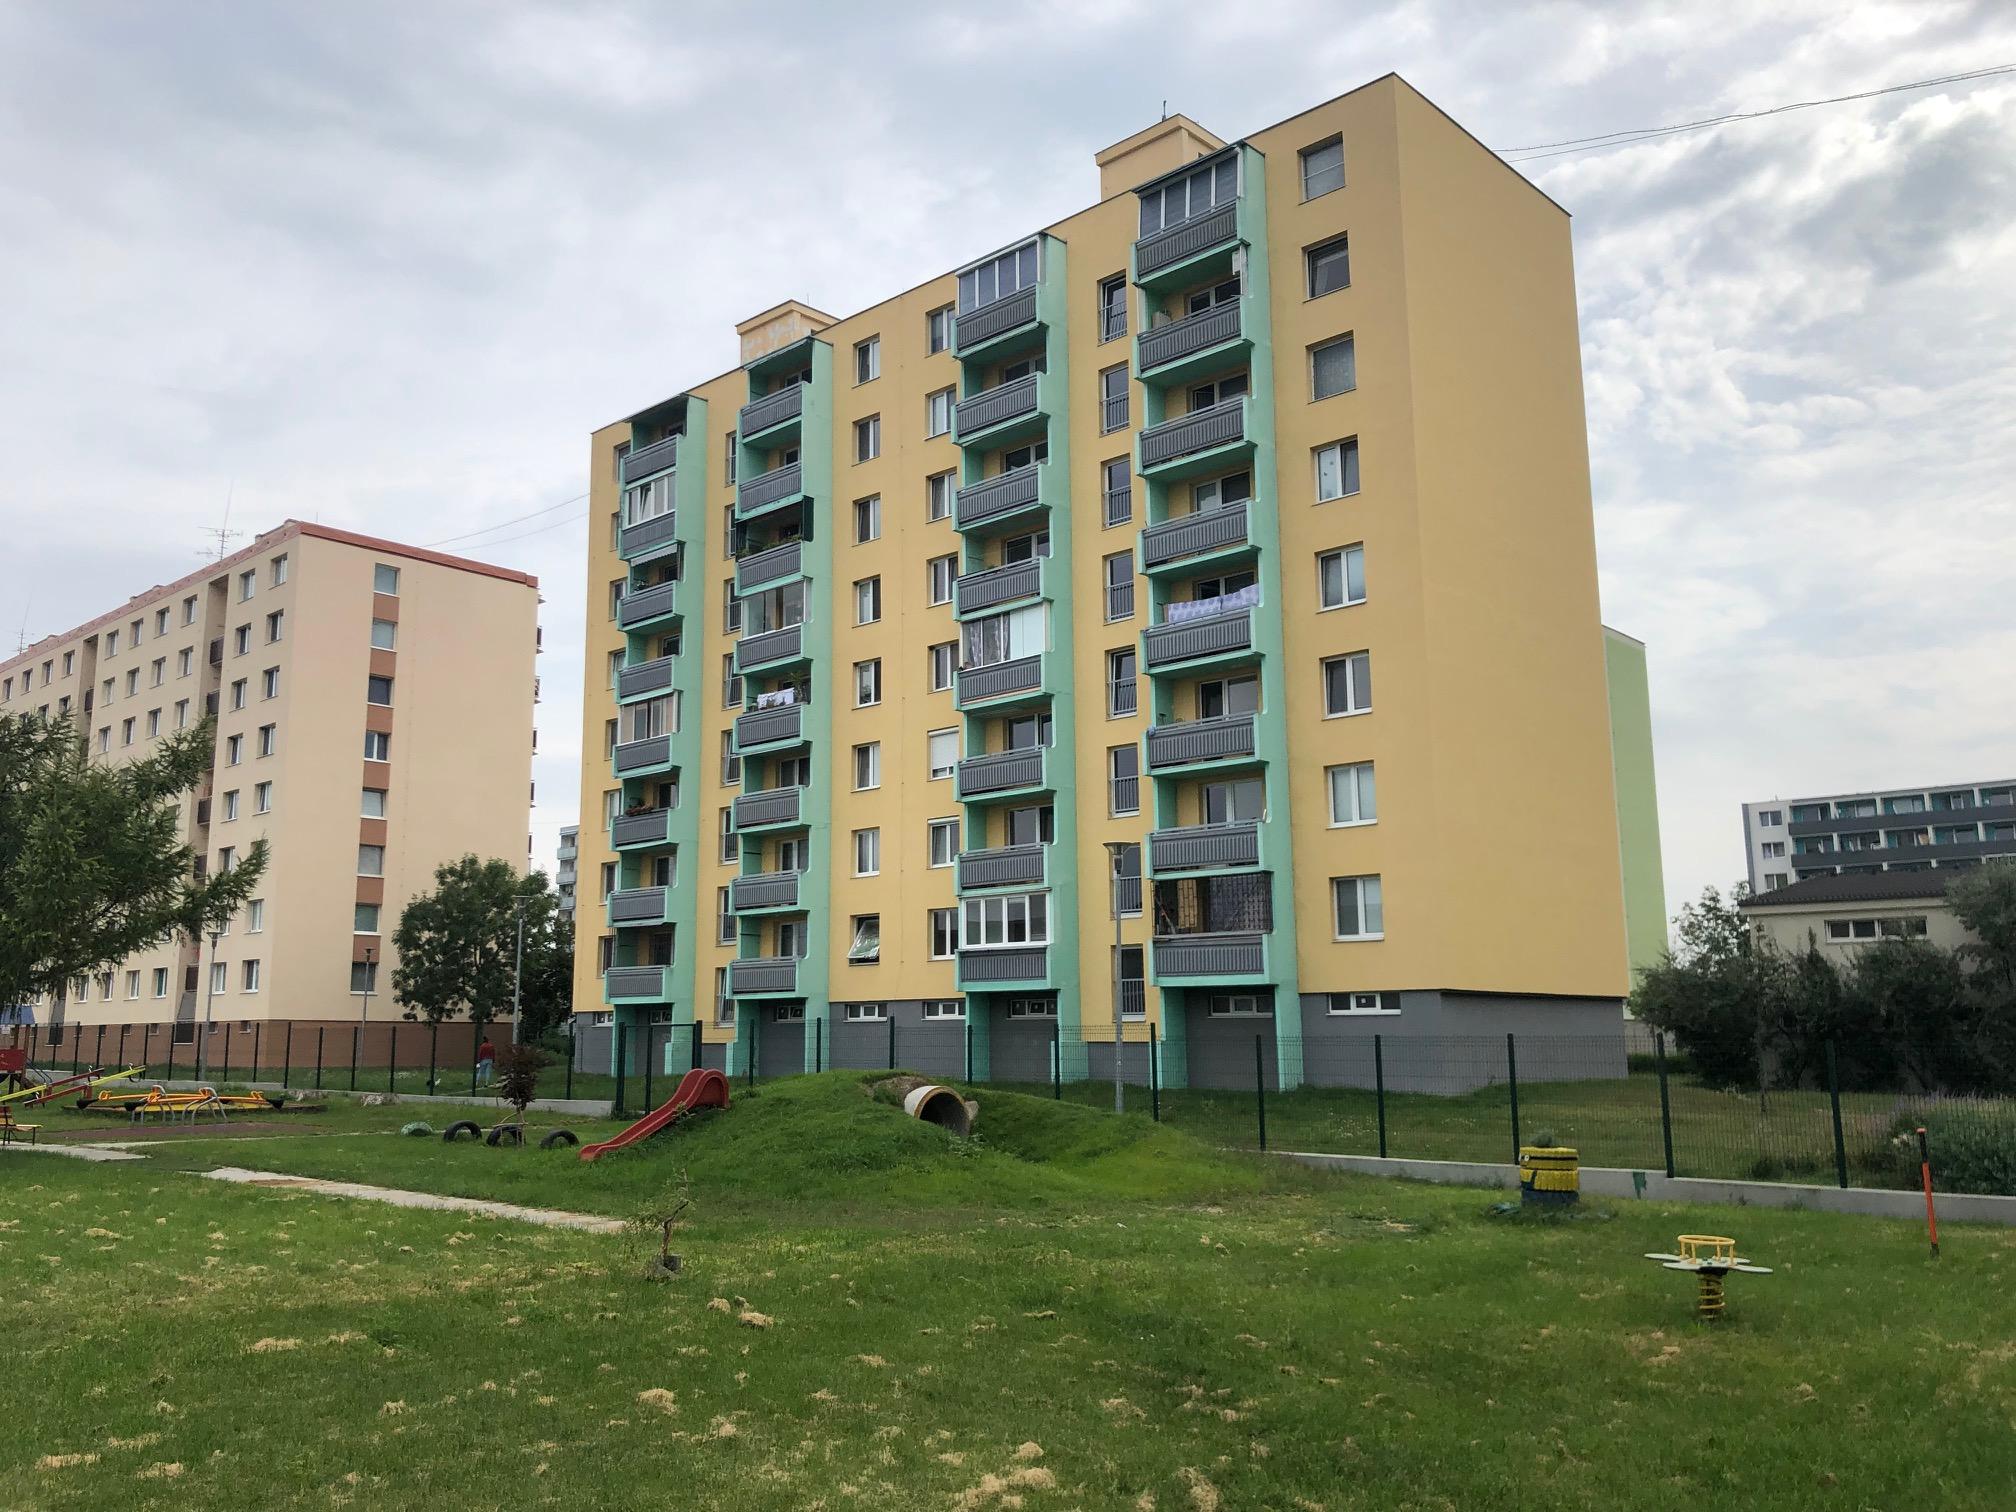 2 izbový byt, 52m2, pivnica, pôvodný stav, Skuteckého, Malacky Juh-0